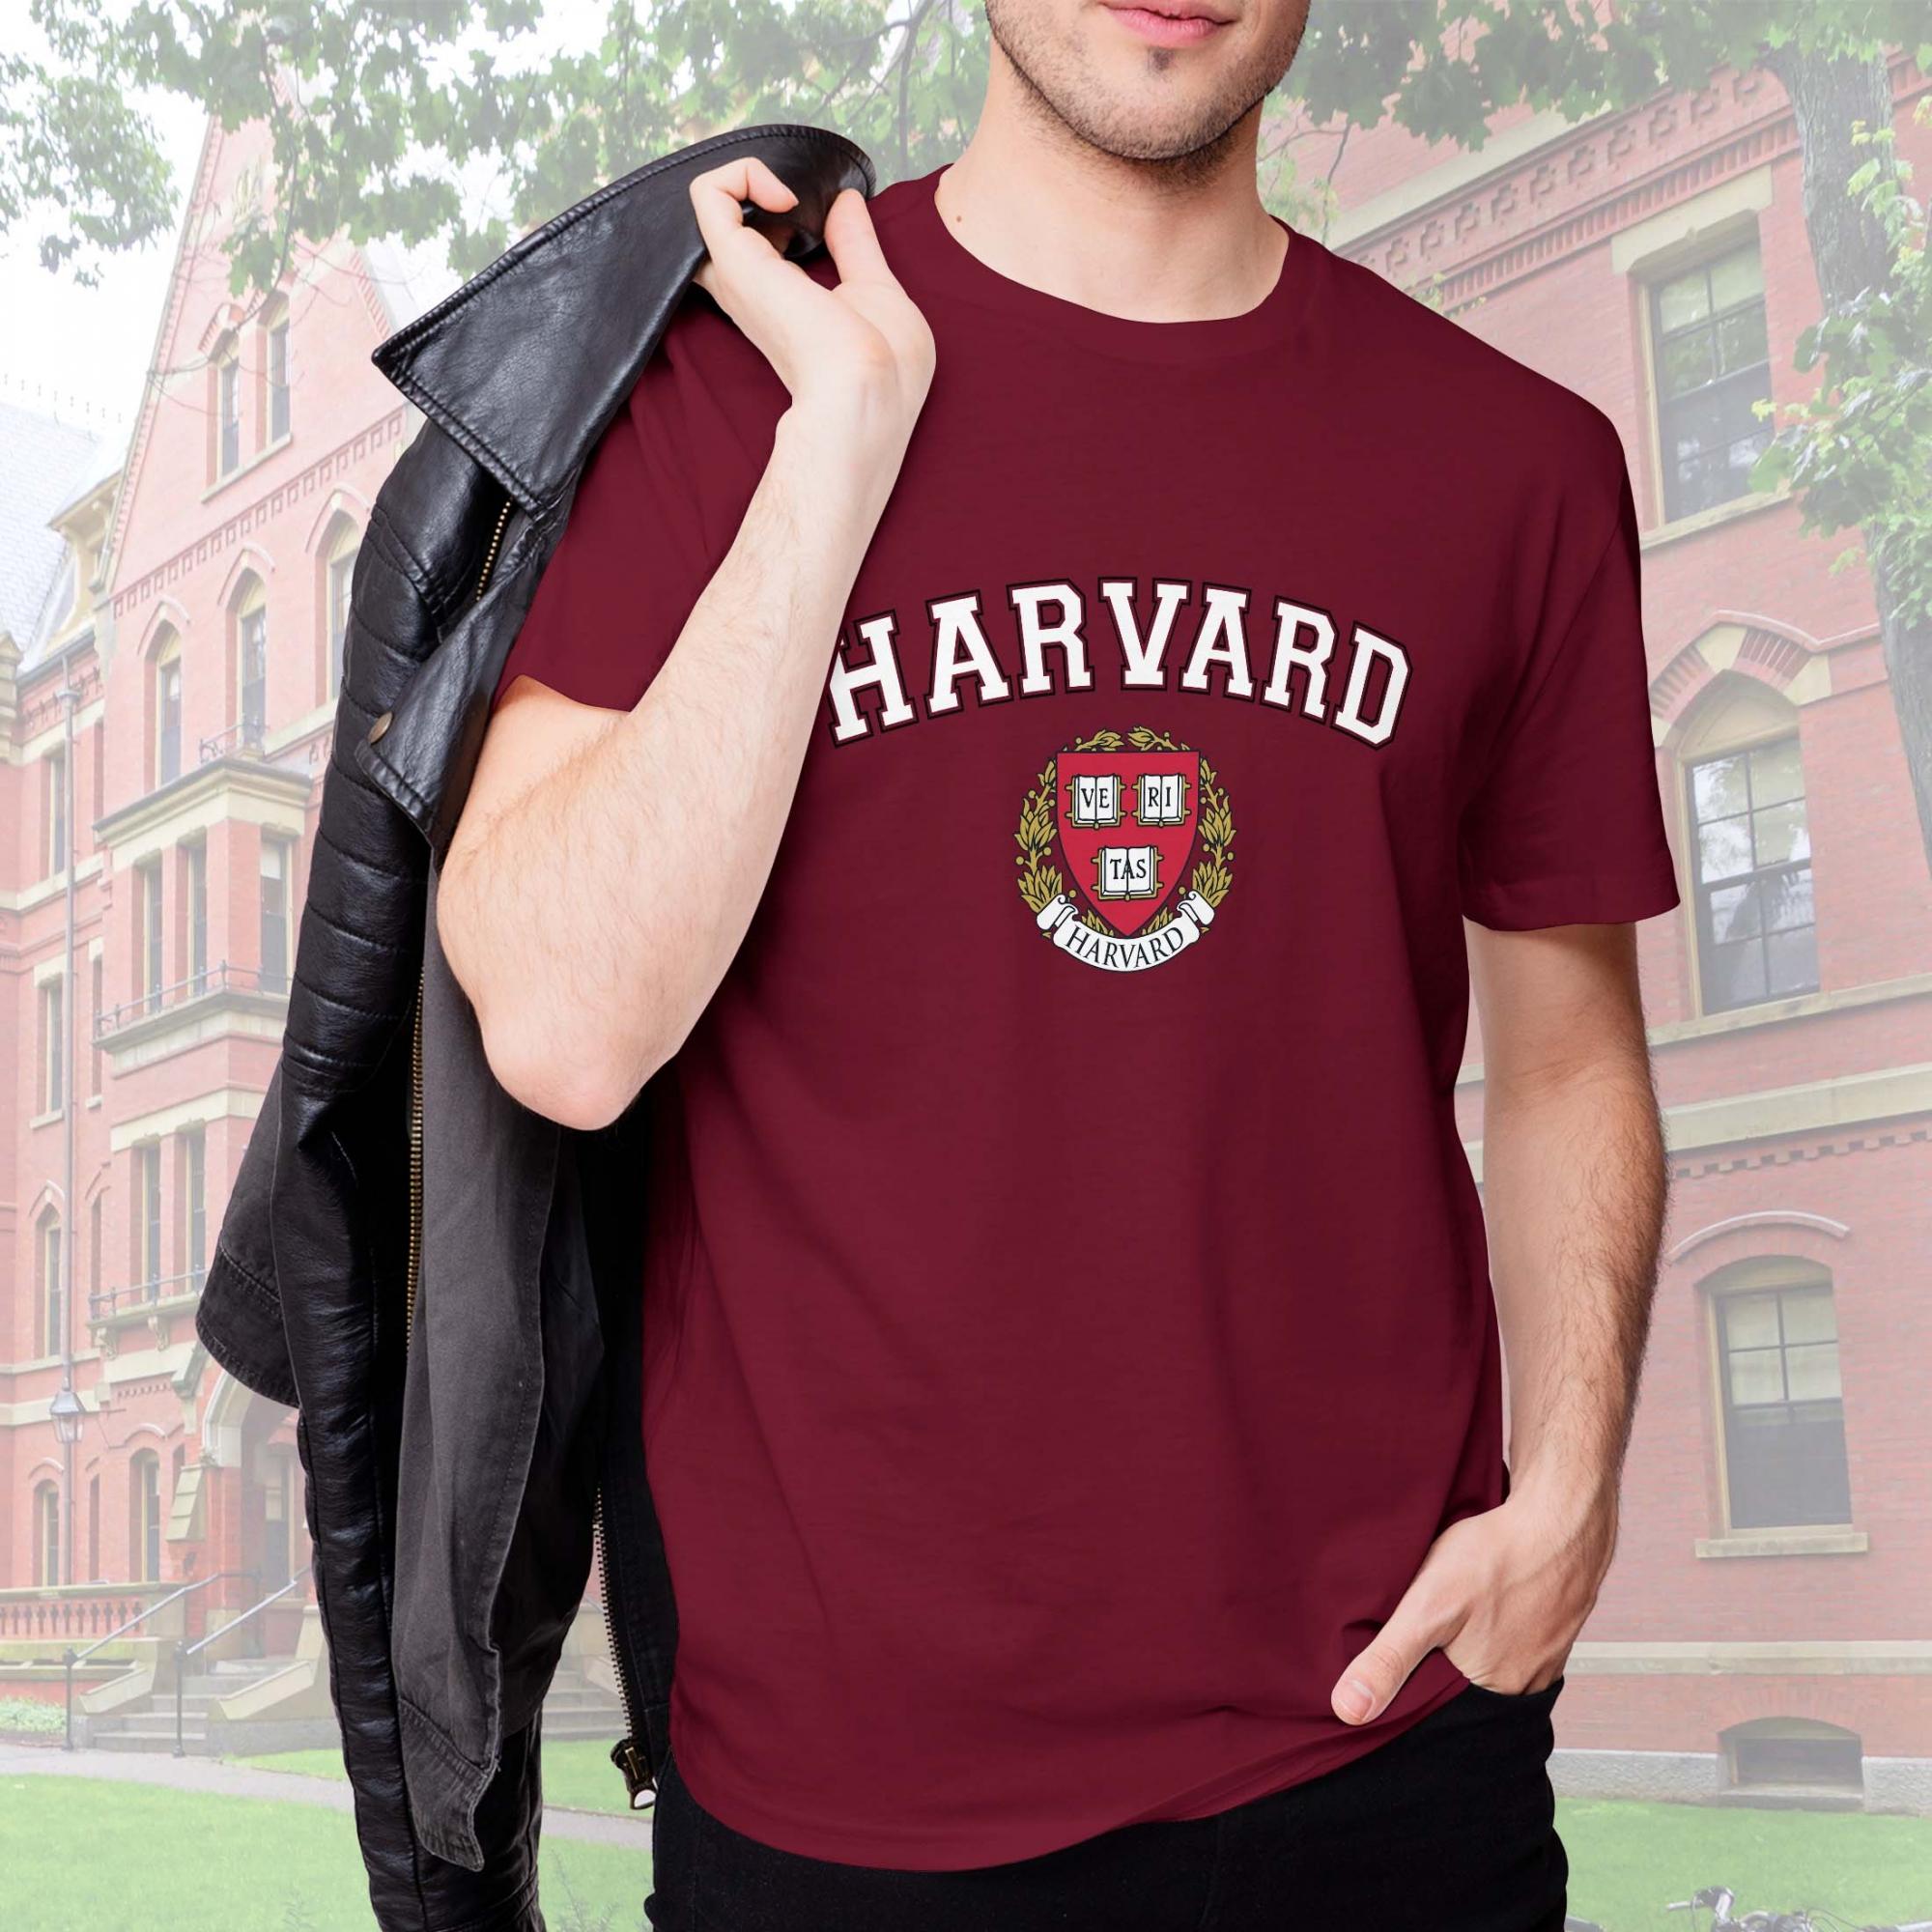 Camiseta Masculina Unissex Universidade Harvard Cambridge Massachusetts Estados Unidos Veritas University (Bordô) - EV